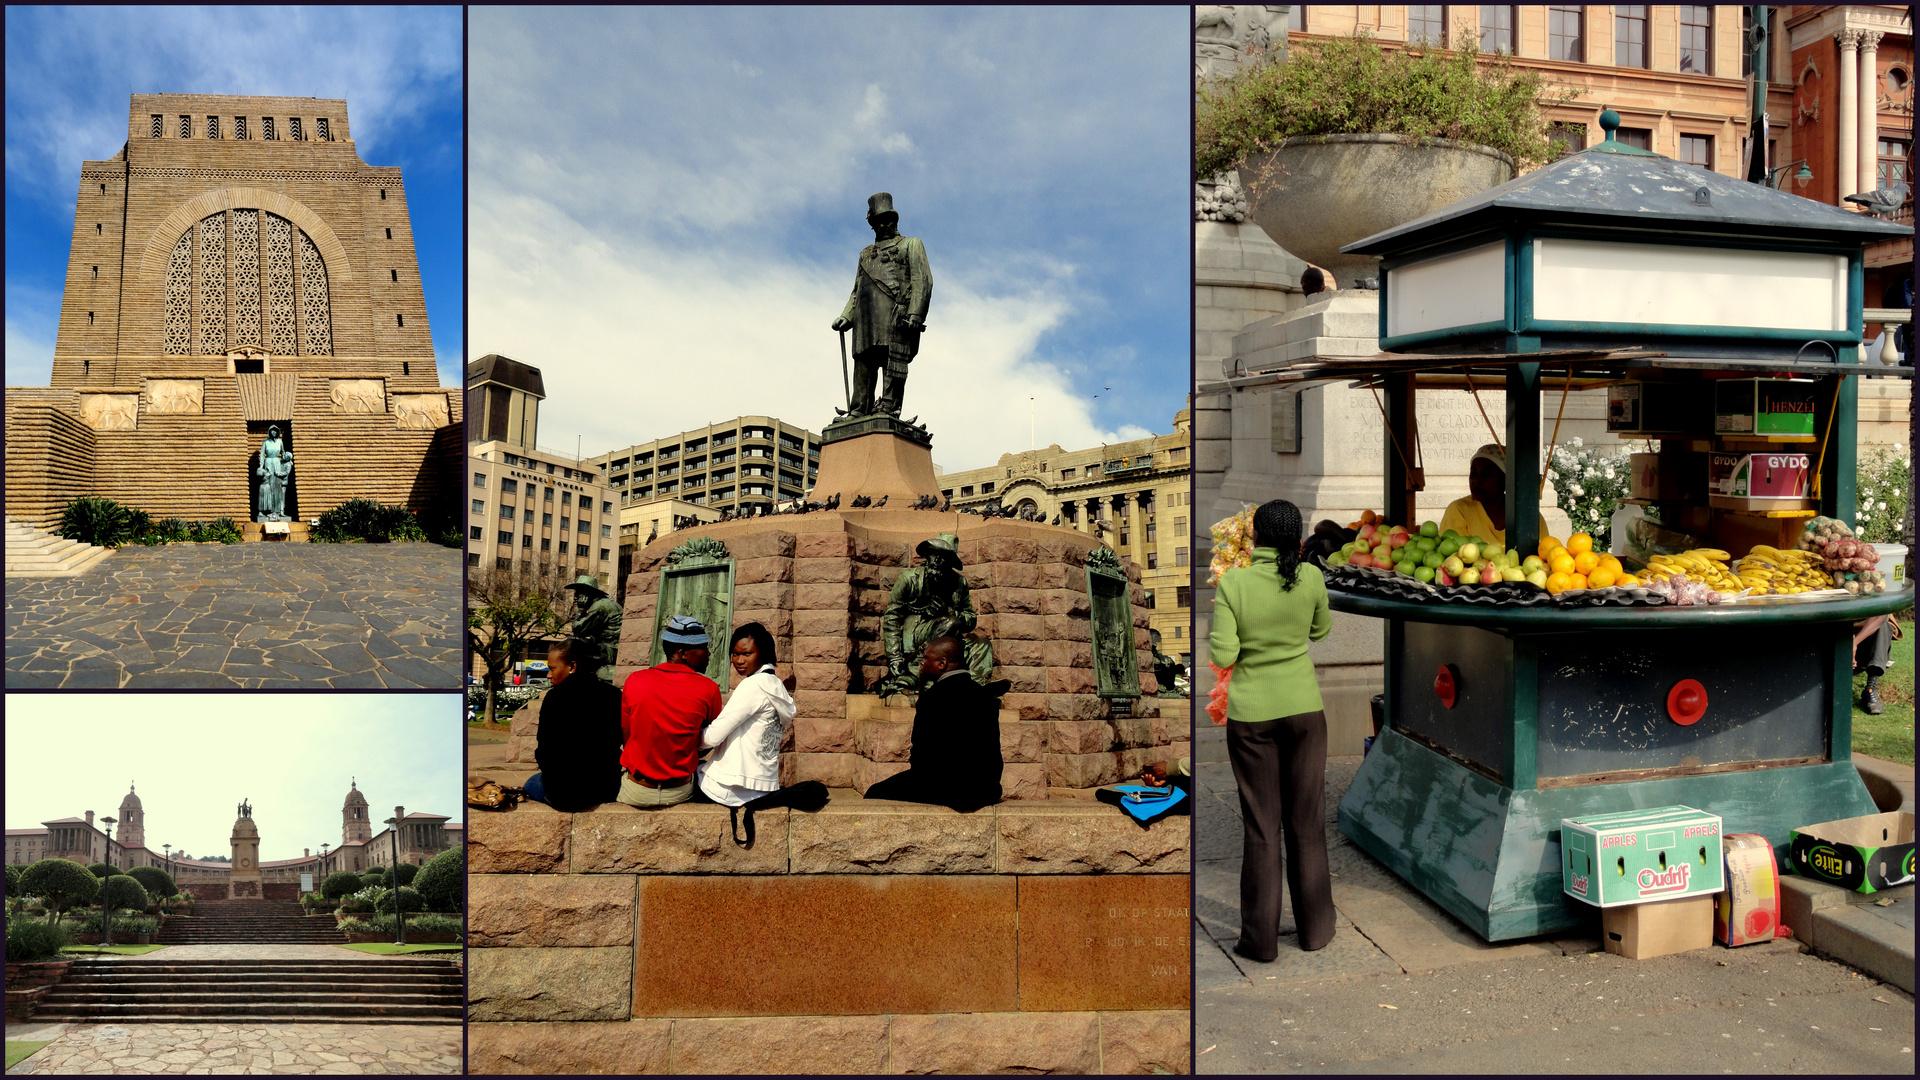 Pretoria (Tshwane)